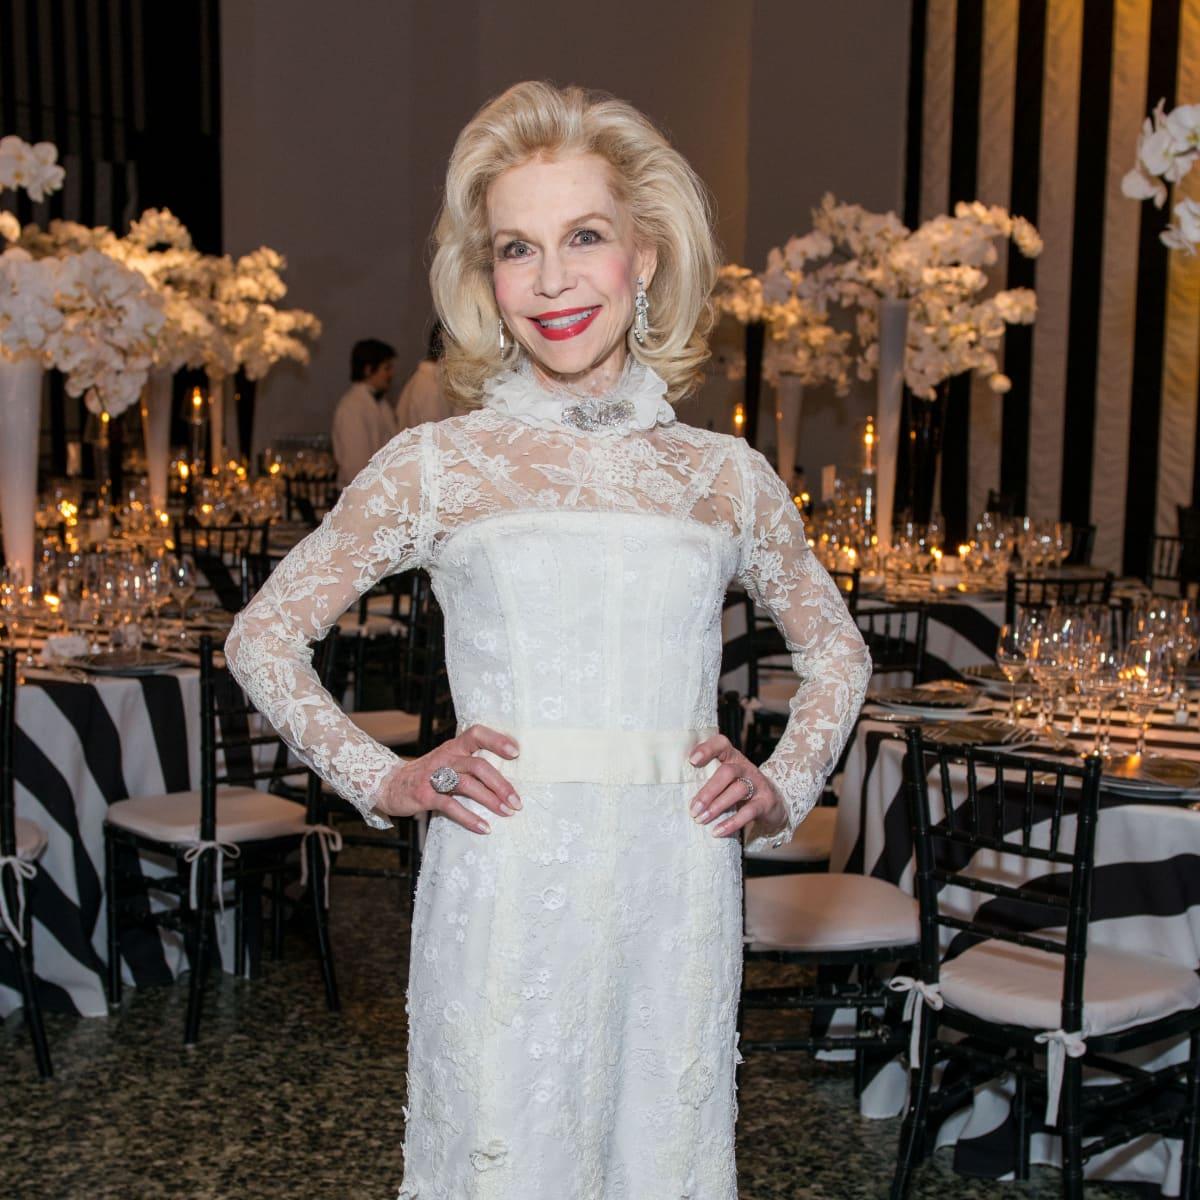 News, Shelby, MFAH gala gowns, Oct. 2015 Lynn Wyatt in Oscar de la Renta